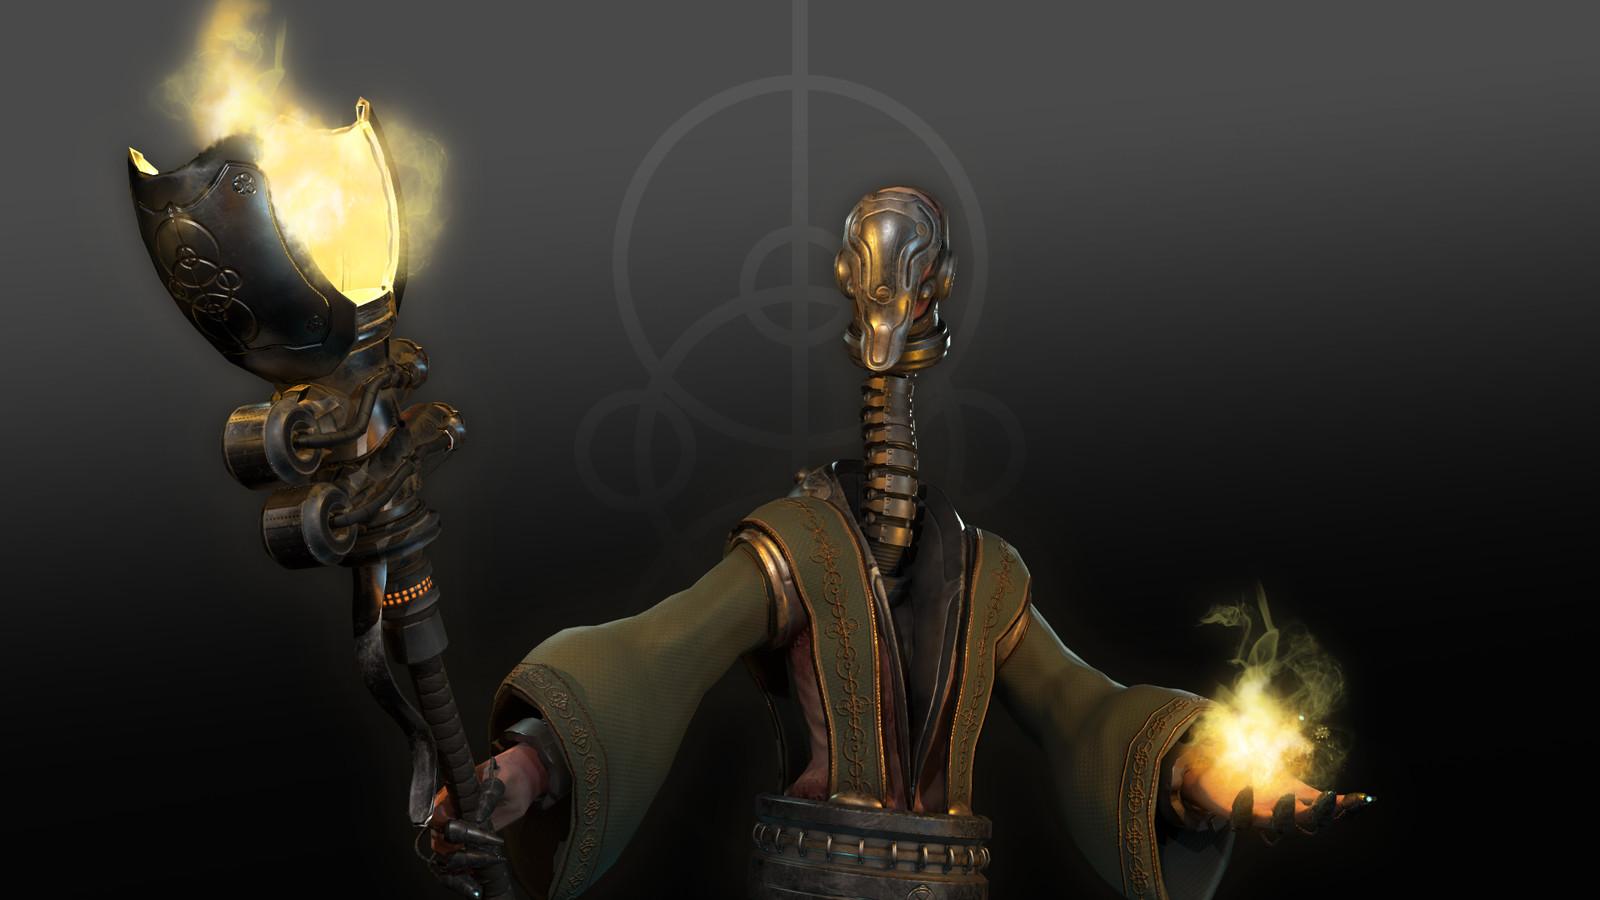 Cyborg Priest